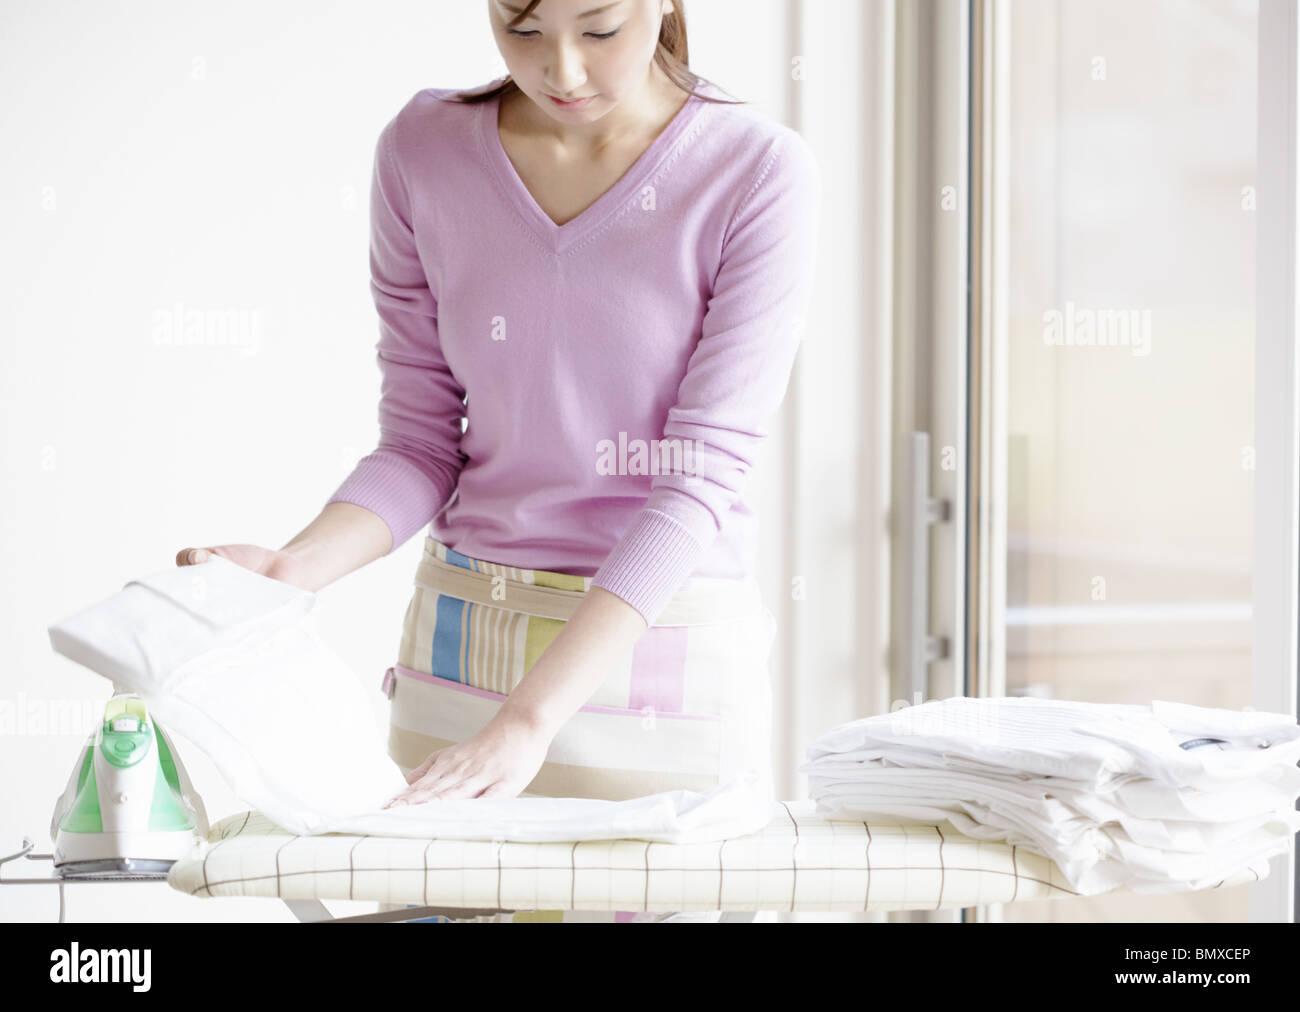 Woman folding shirt - Stock Image